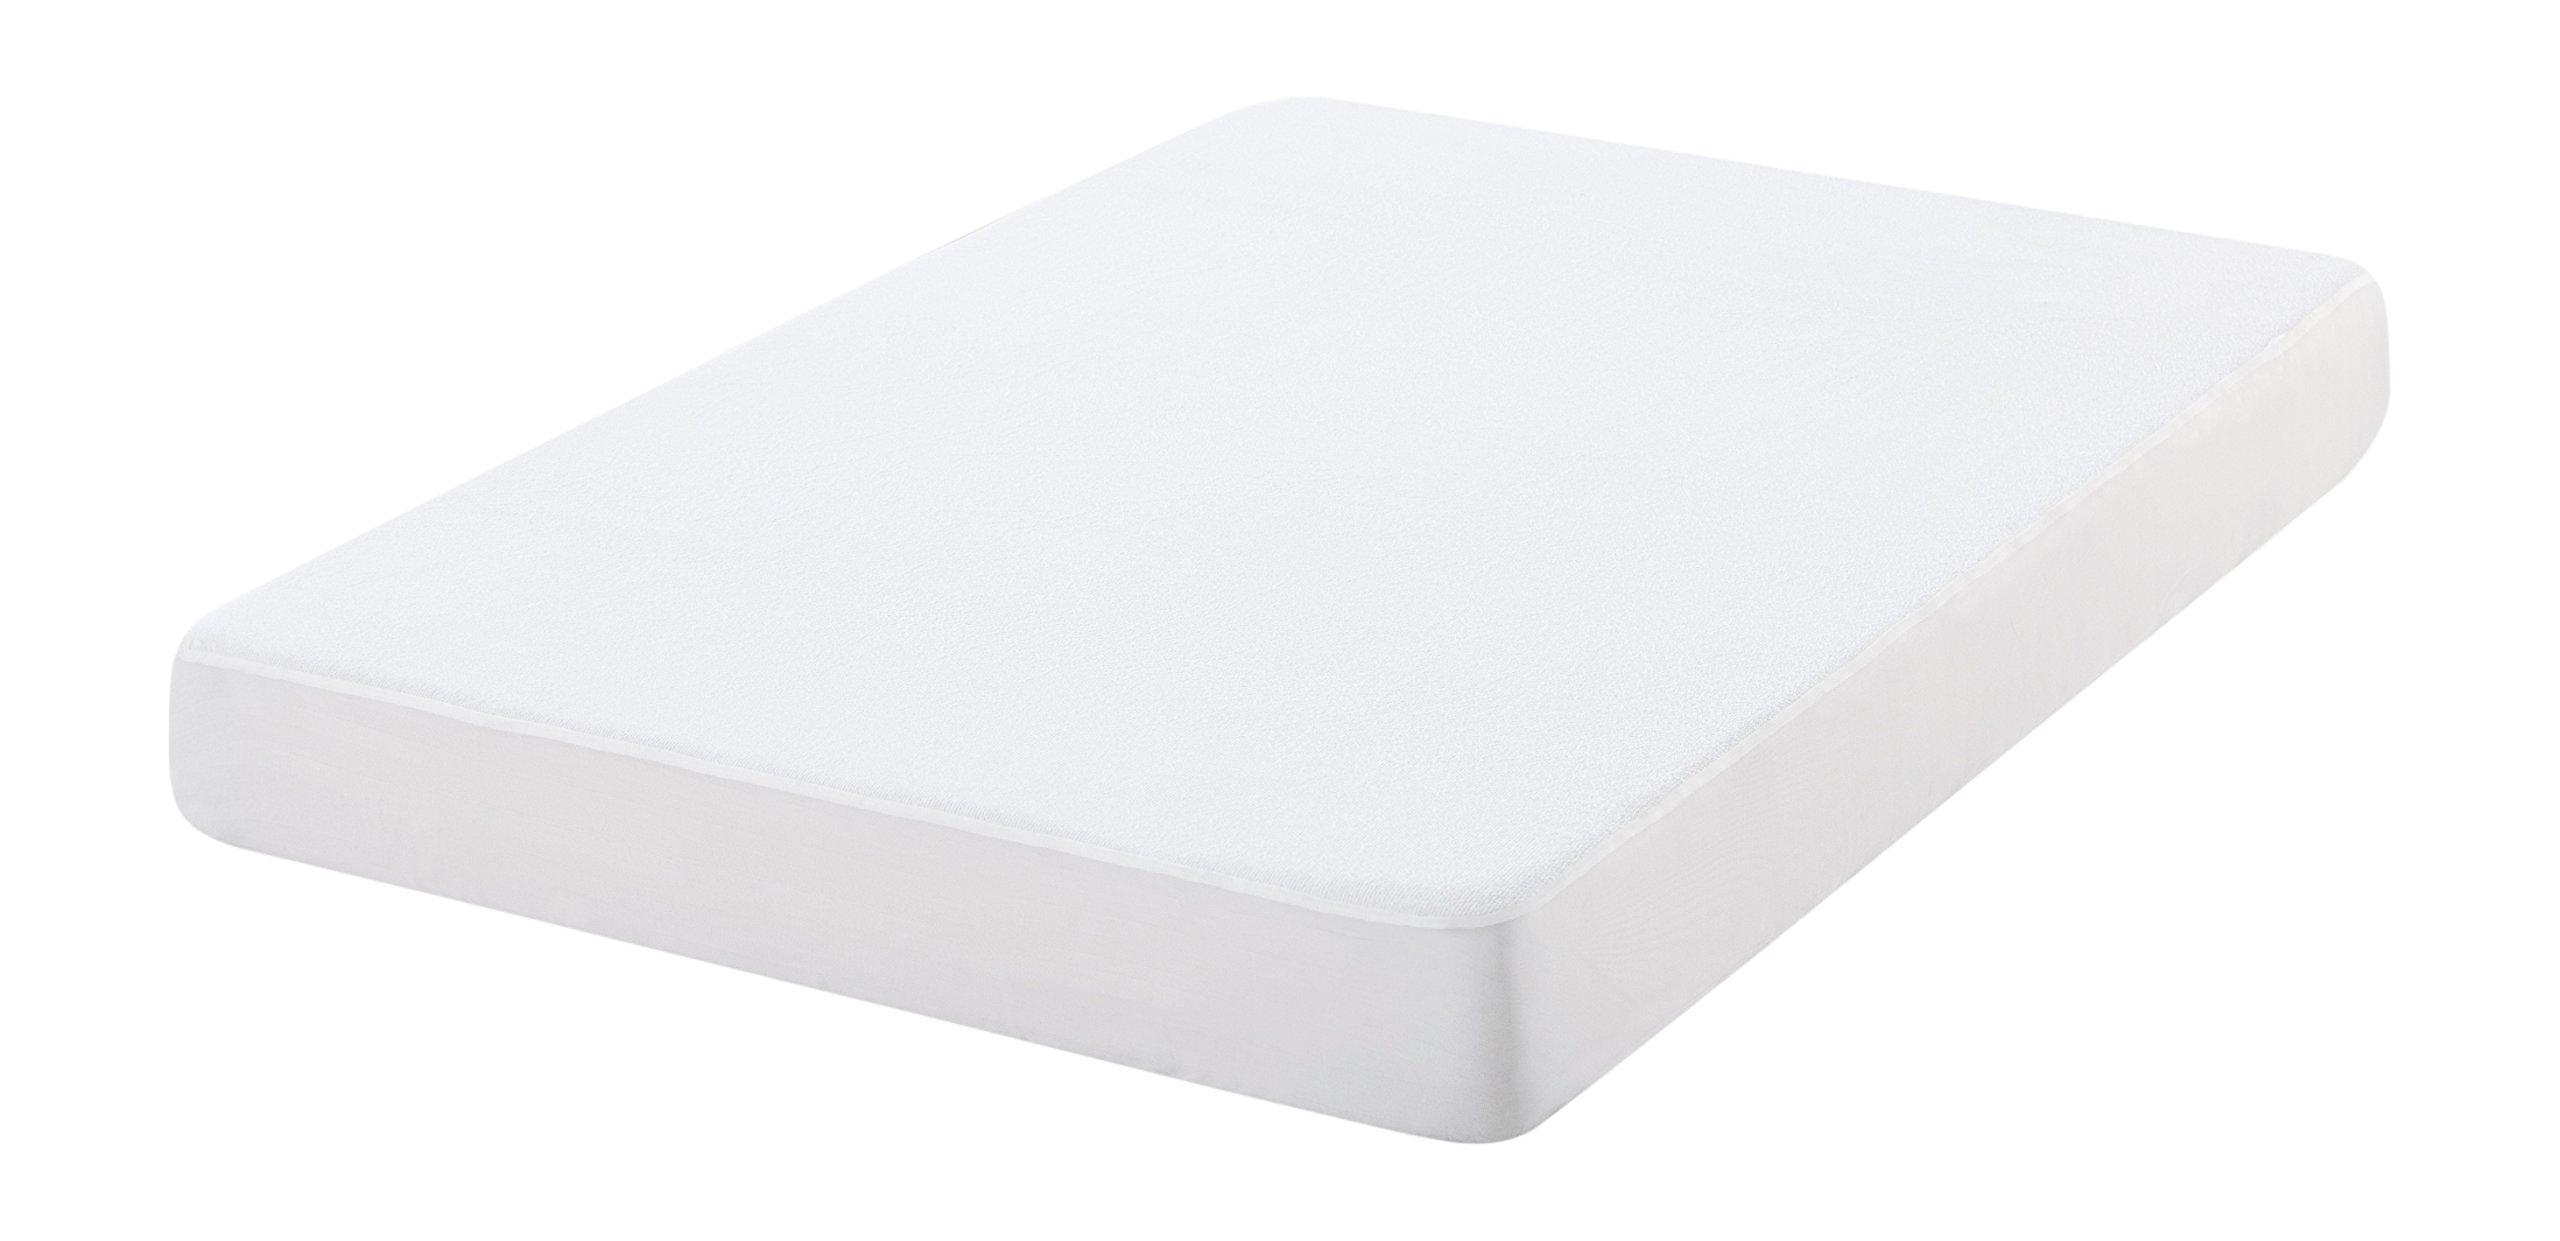 Oasis Funda de colchón antiácaros de Rizo, 100% algodón, Blanco, 190x80x25 cm